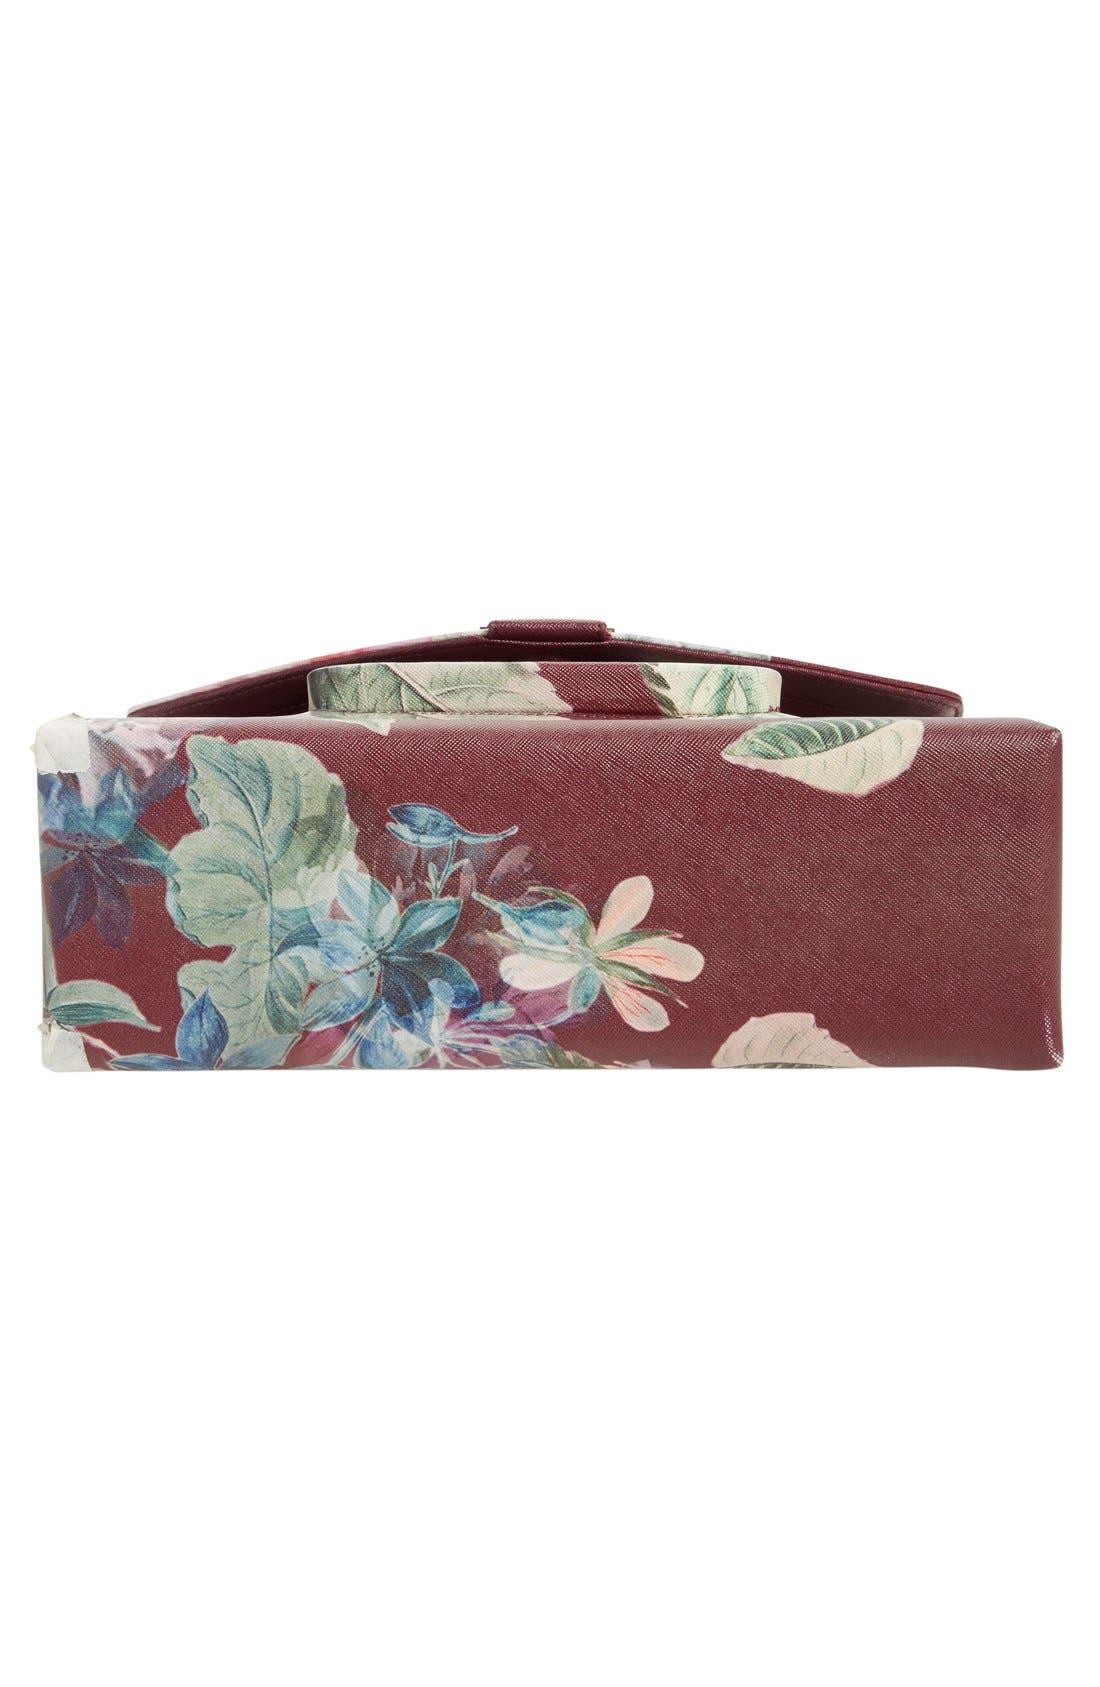 TED BAKER LONDON, Floral Print Faux Leather Satchel, Alternate thumbnail 2, color, 930